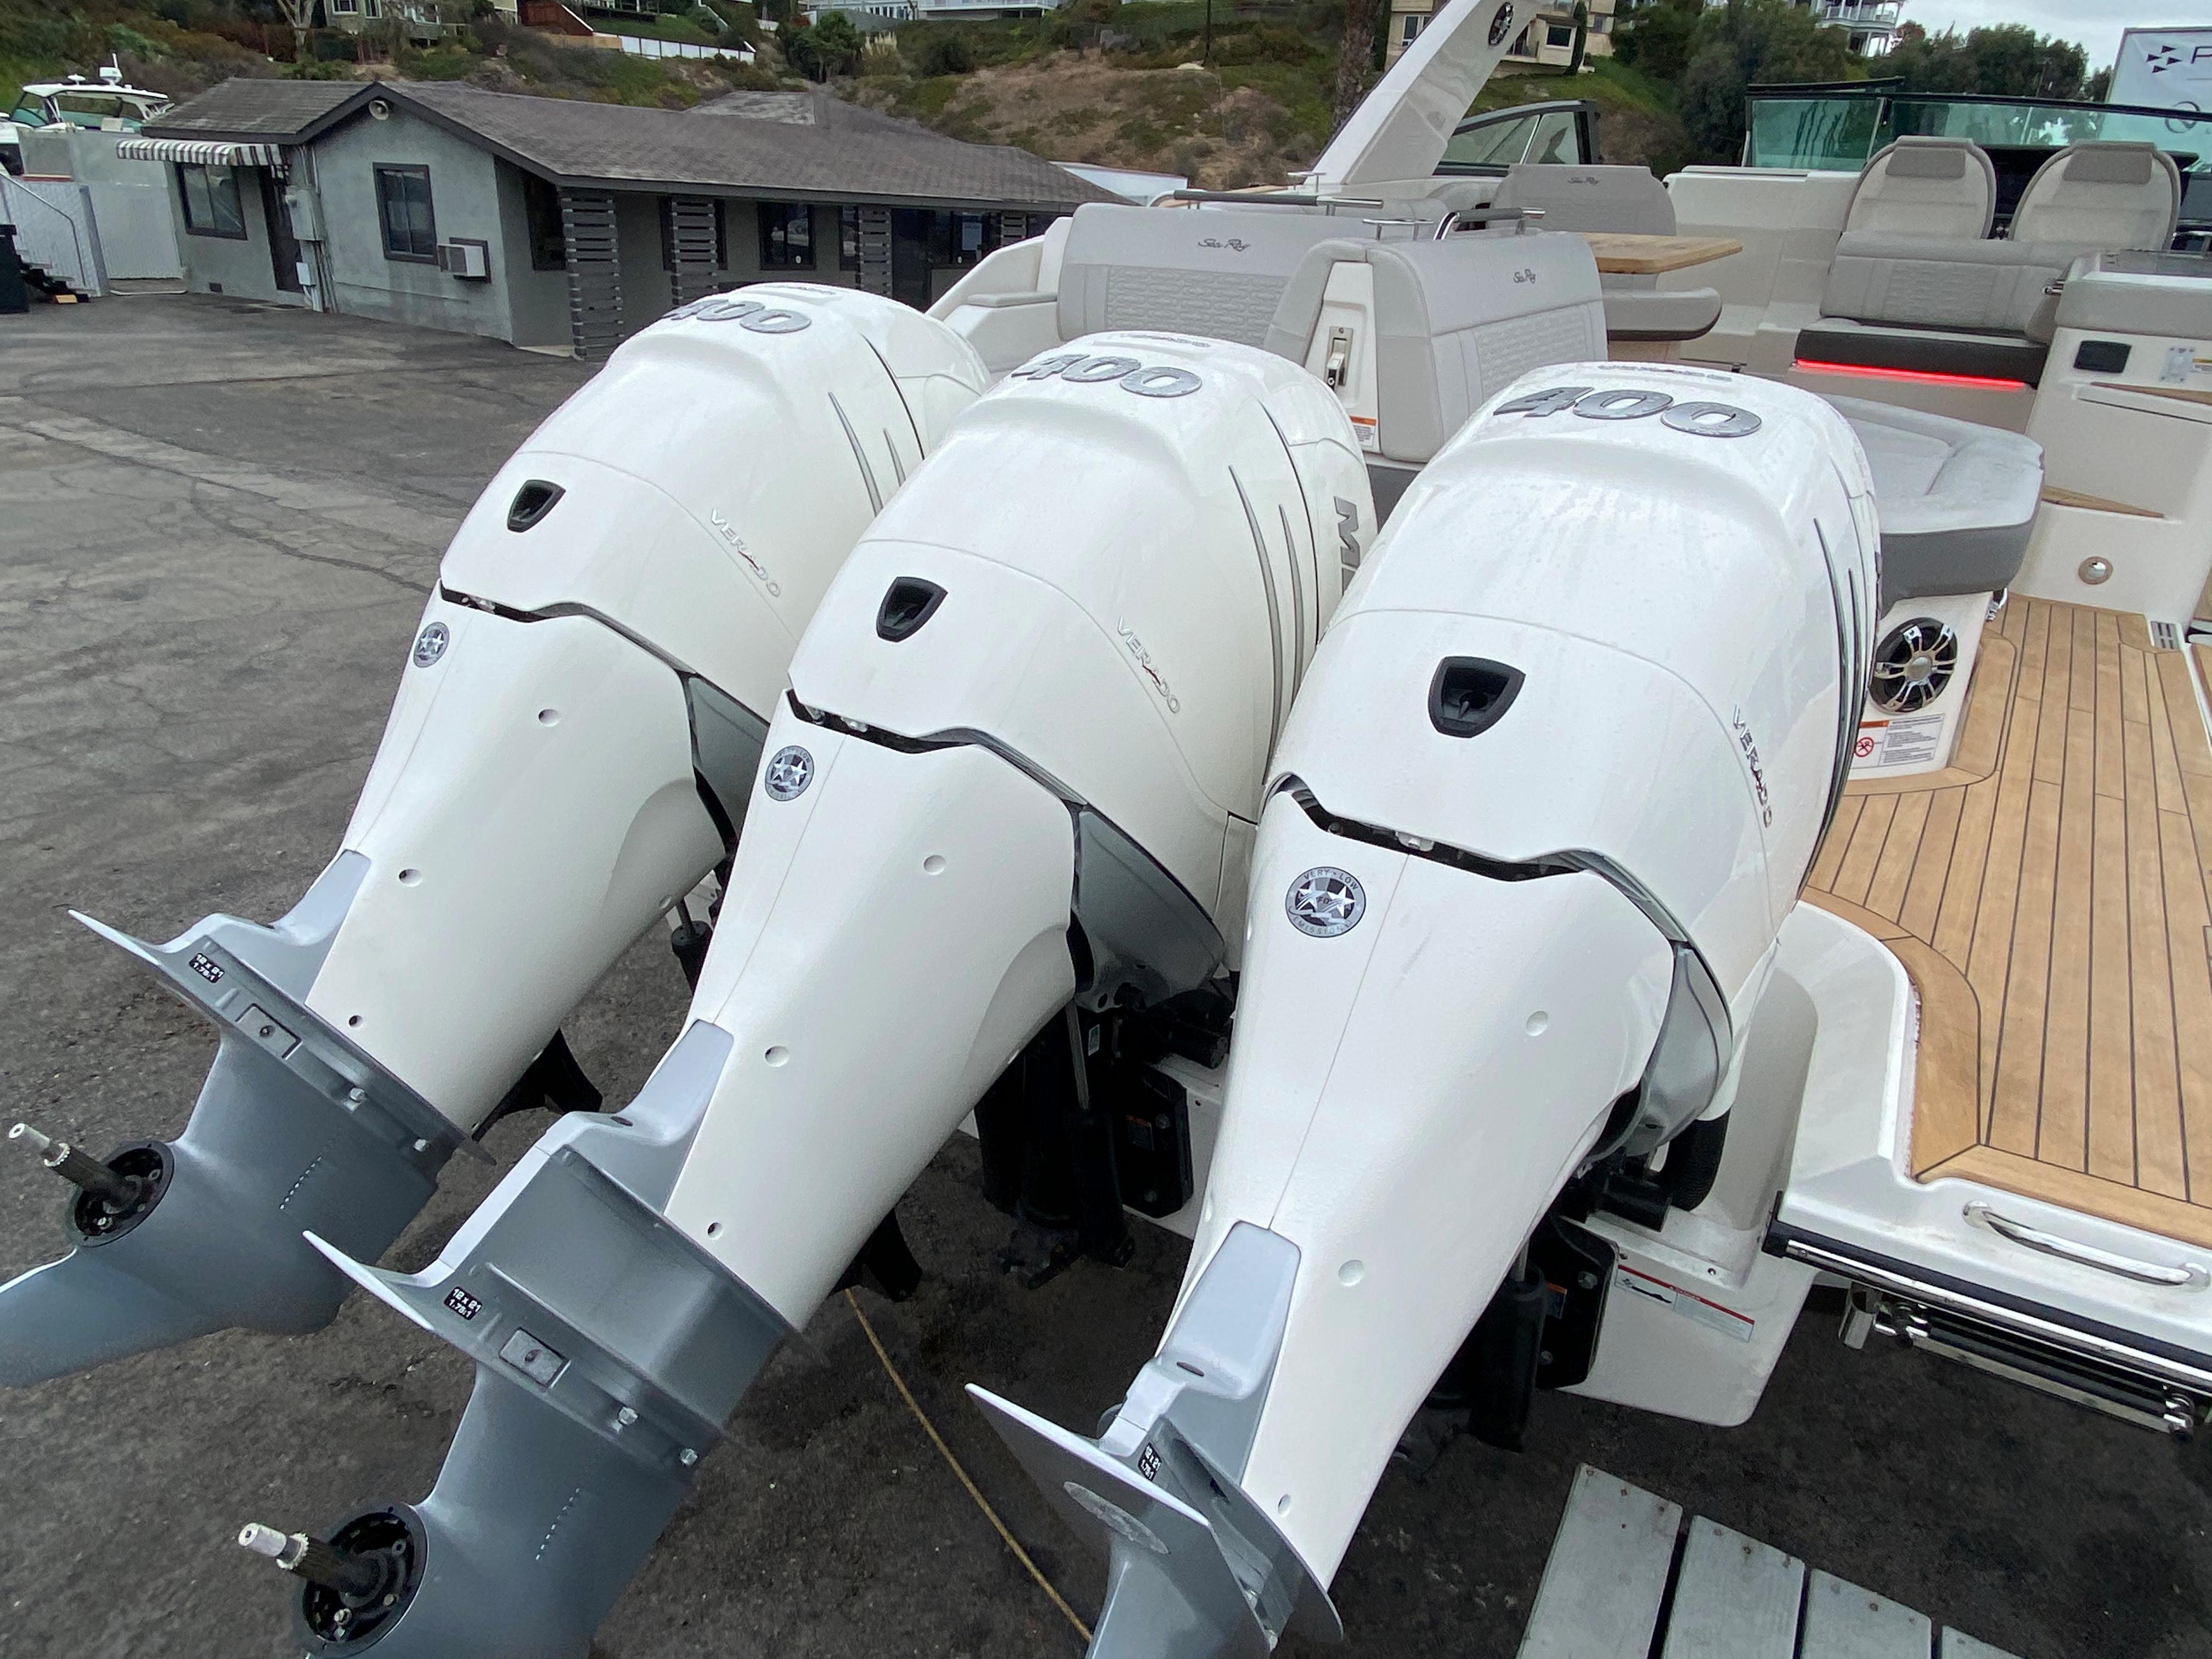 2021 Sea Ray SLX 400 OB #S1309H inventory image at Sun Country Coastal in Newport Beach